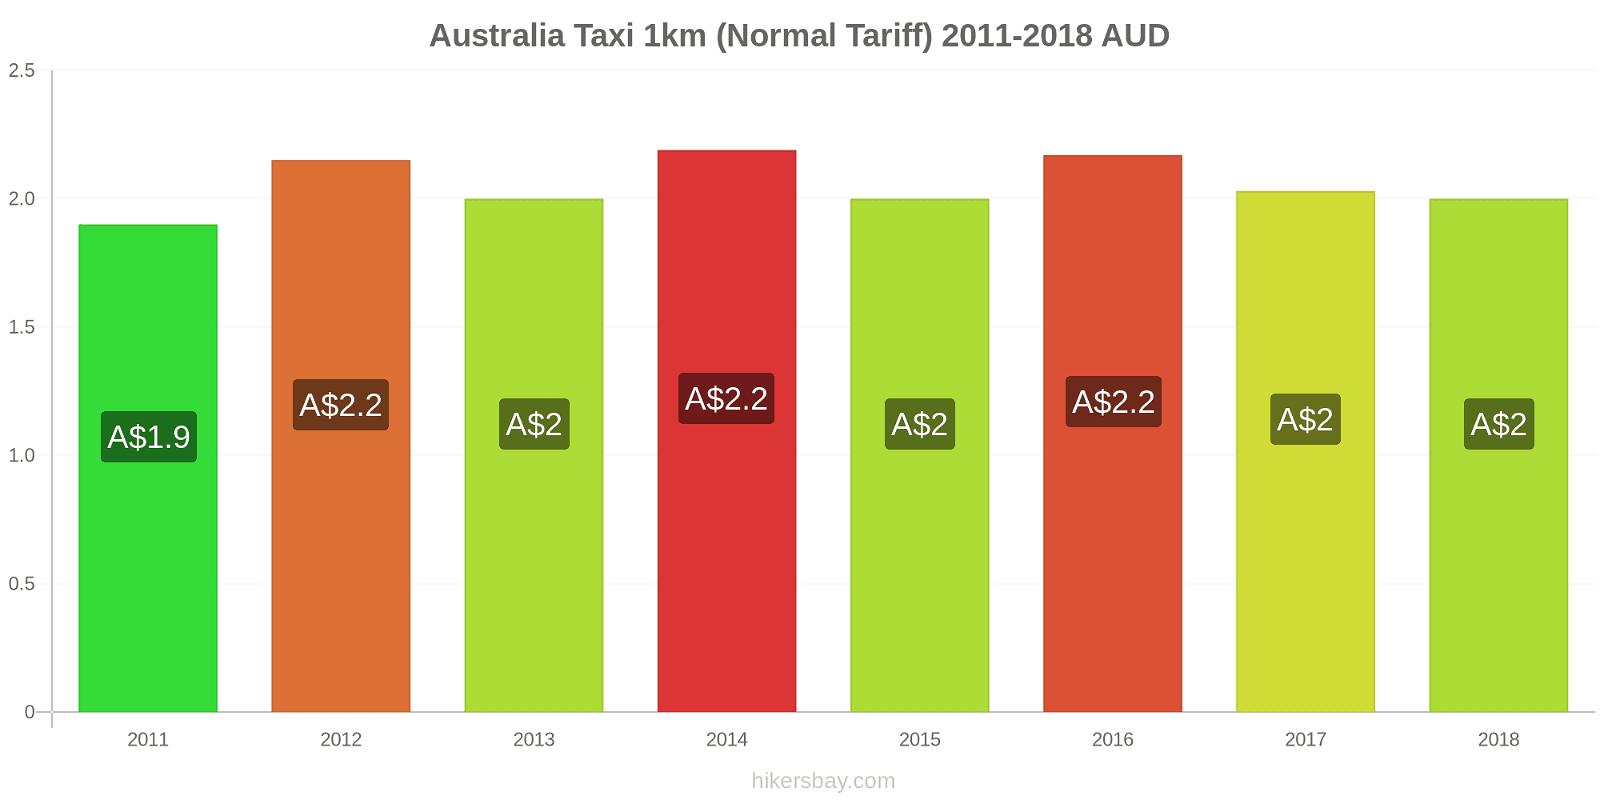 Australia price changes Taxi 1km (Normal Tariff) hikersbay.com